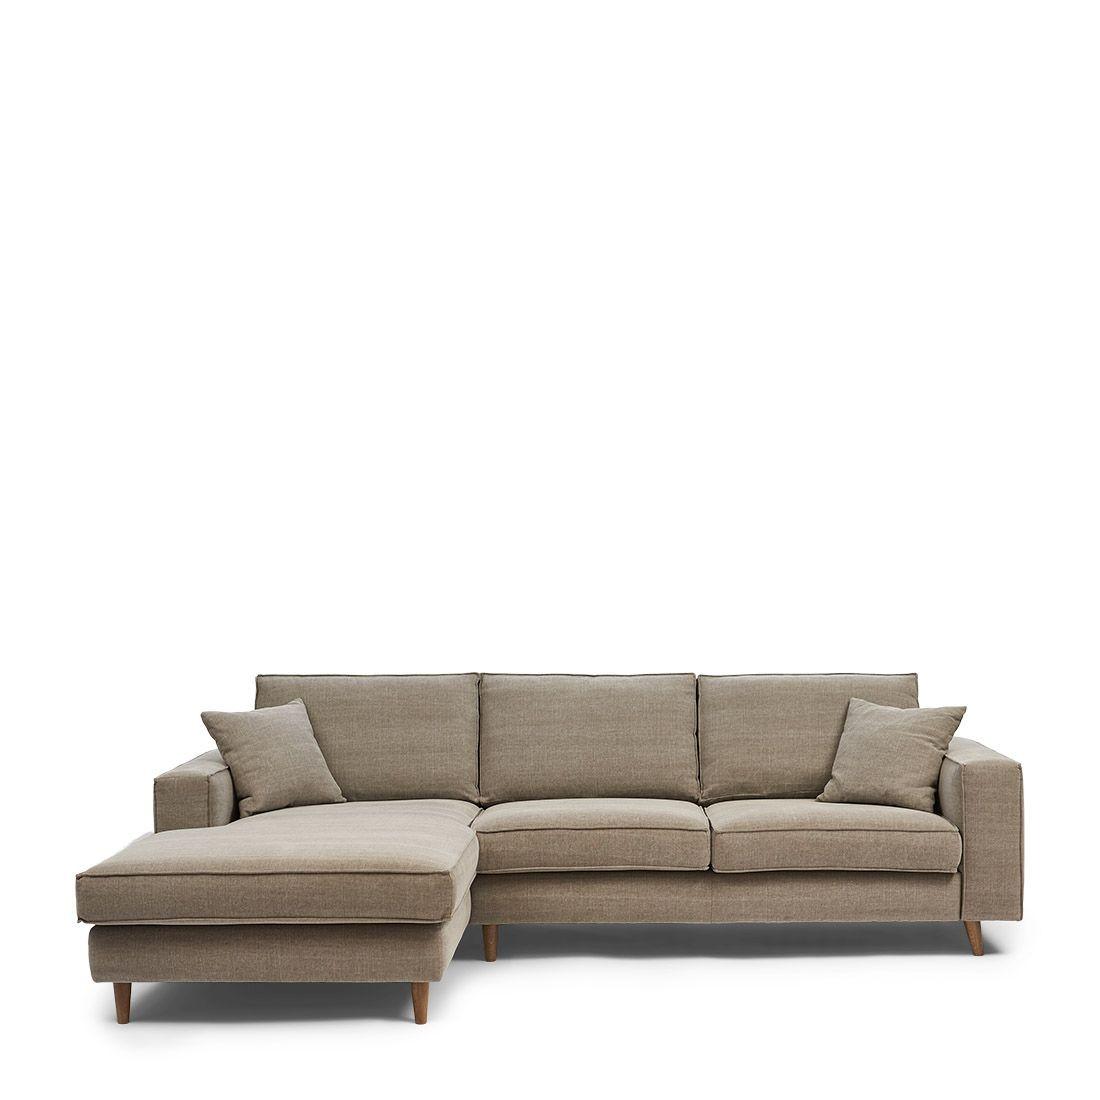 Kendall Sofa With Chaise Longue Left cotton stone / Rivièra Maison